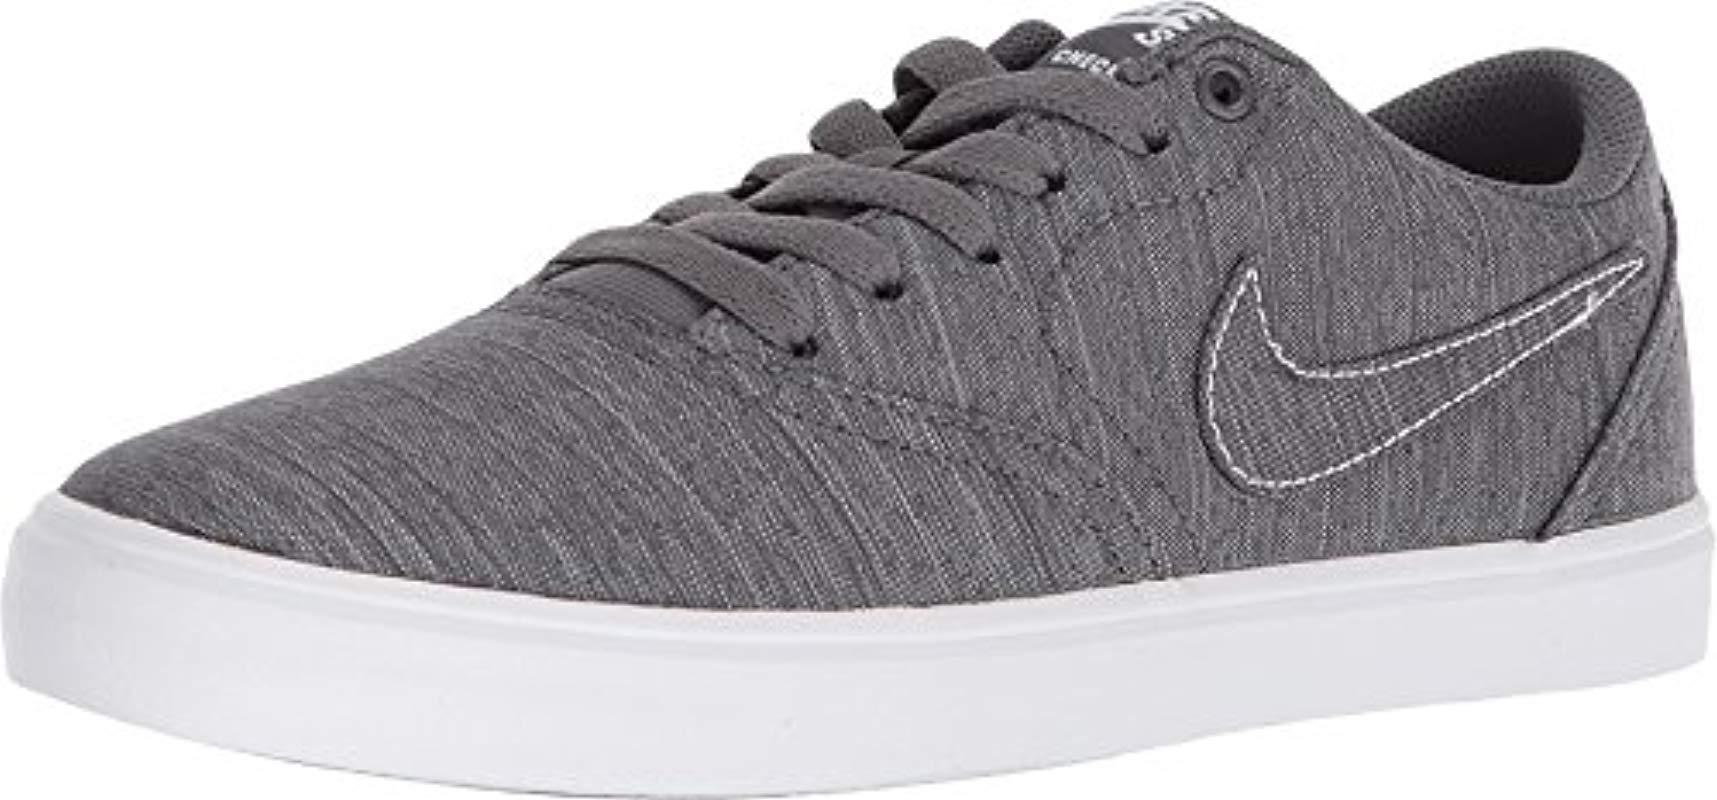 076c39e3102f Nike Wmns Sb Check Solar Cnvs Skateboarding Shoes in Gray - Lyst